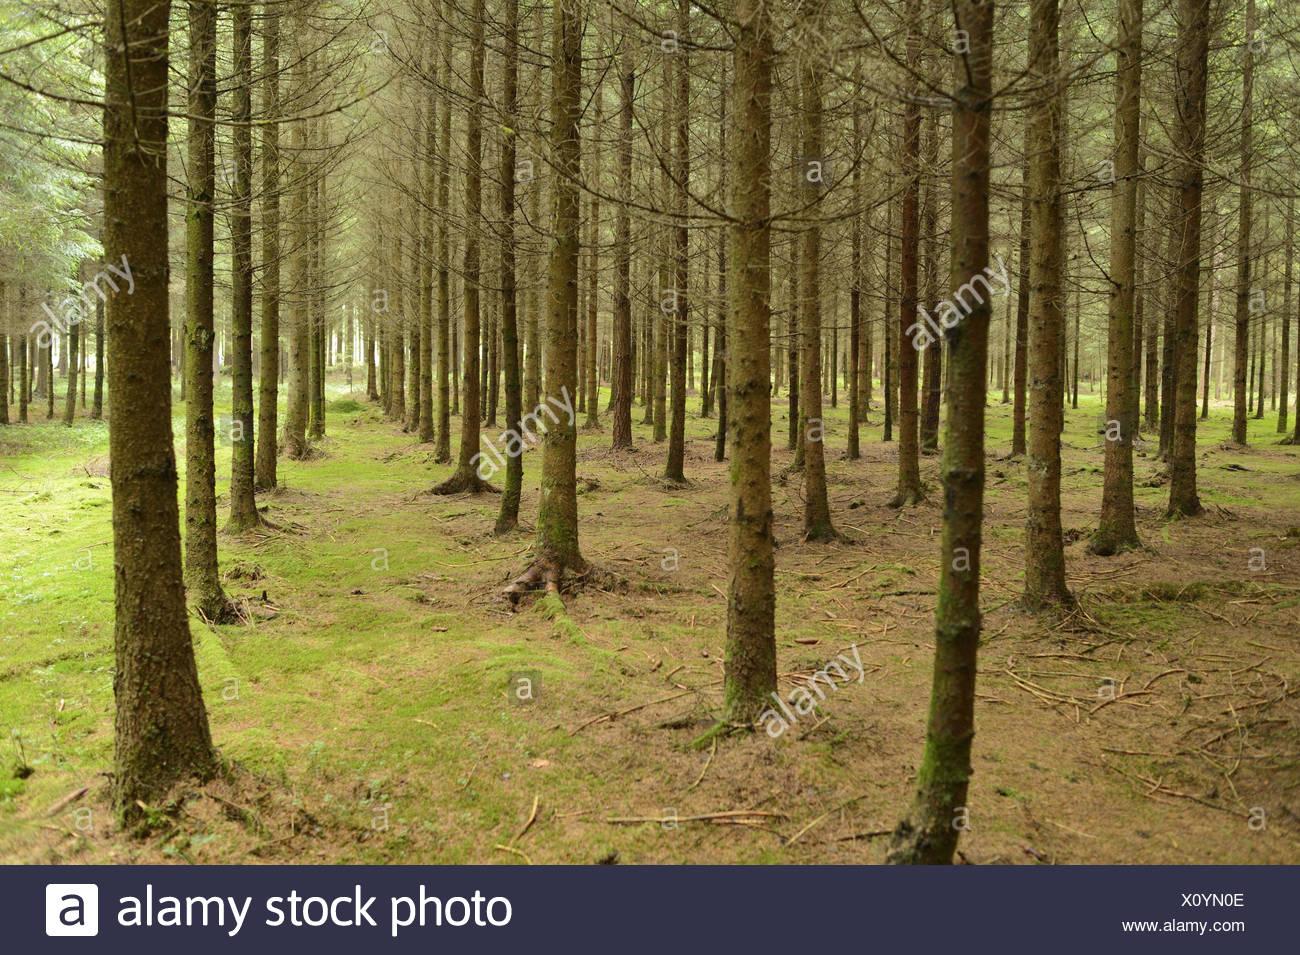 Atemberaubend Fichten Picea Abies Fichte Wald, Monokultur Stockfoto, Bild &CP_38